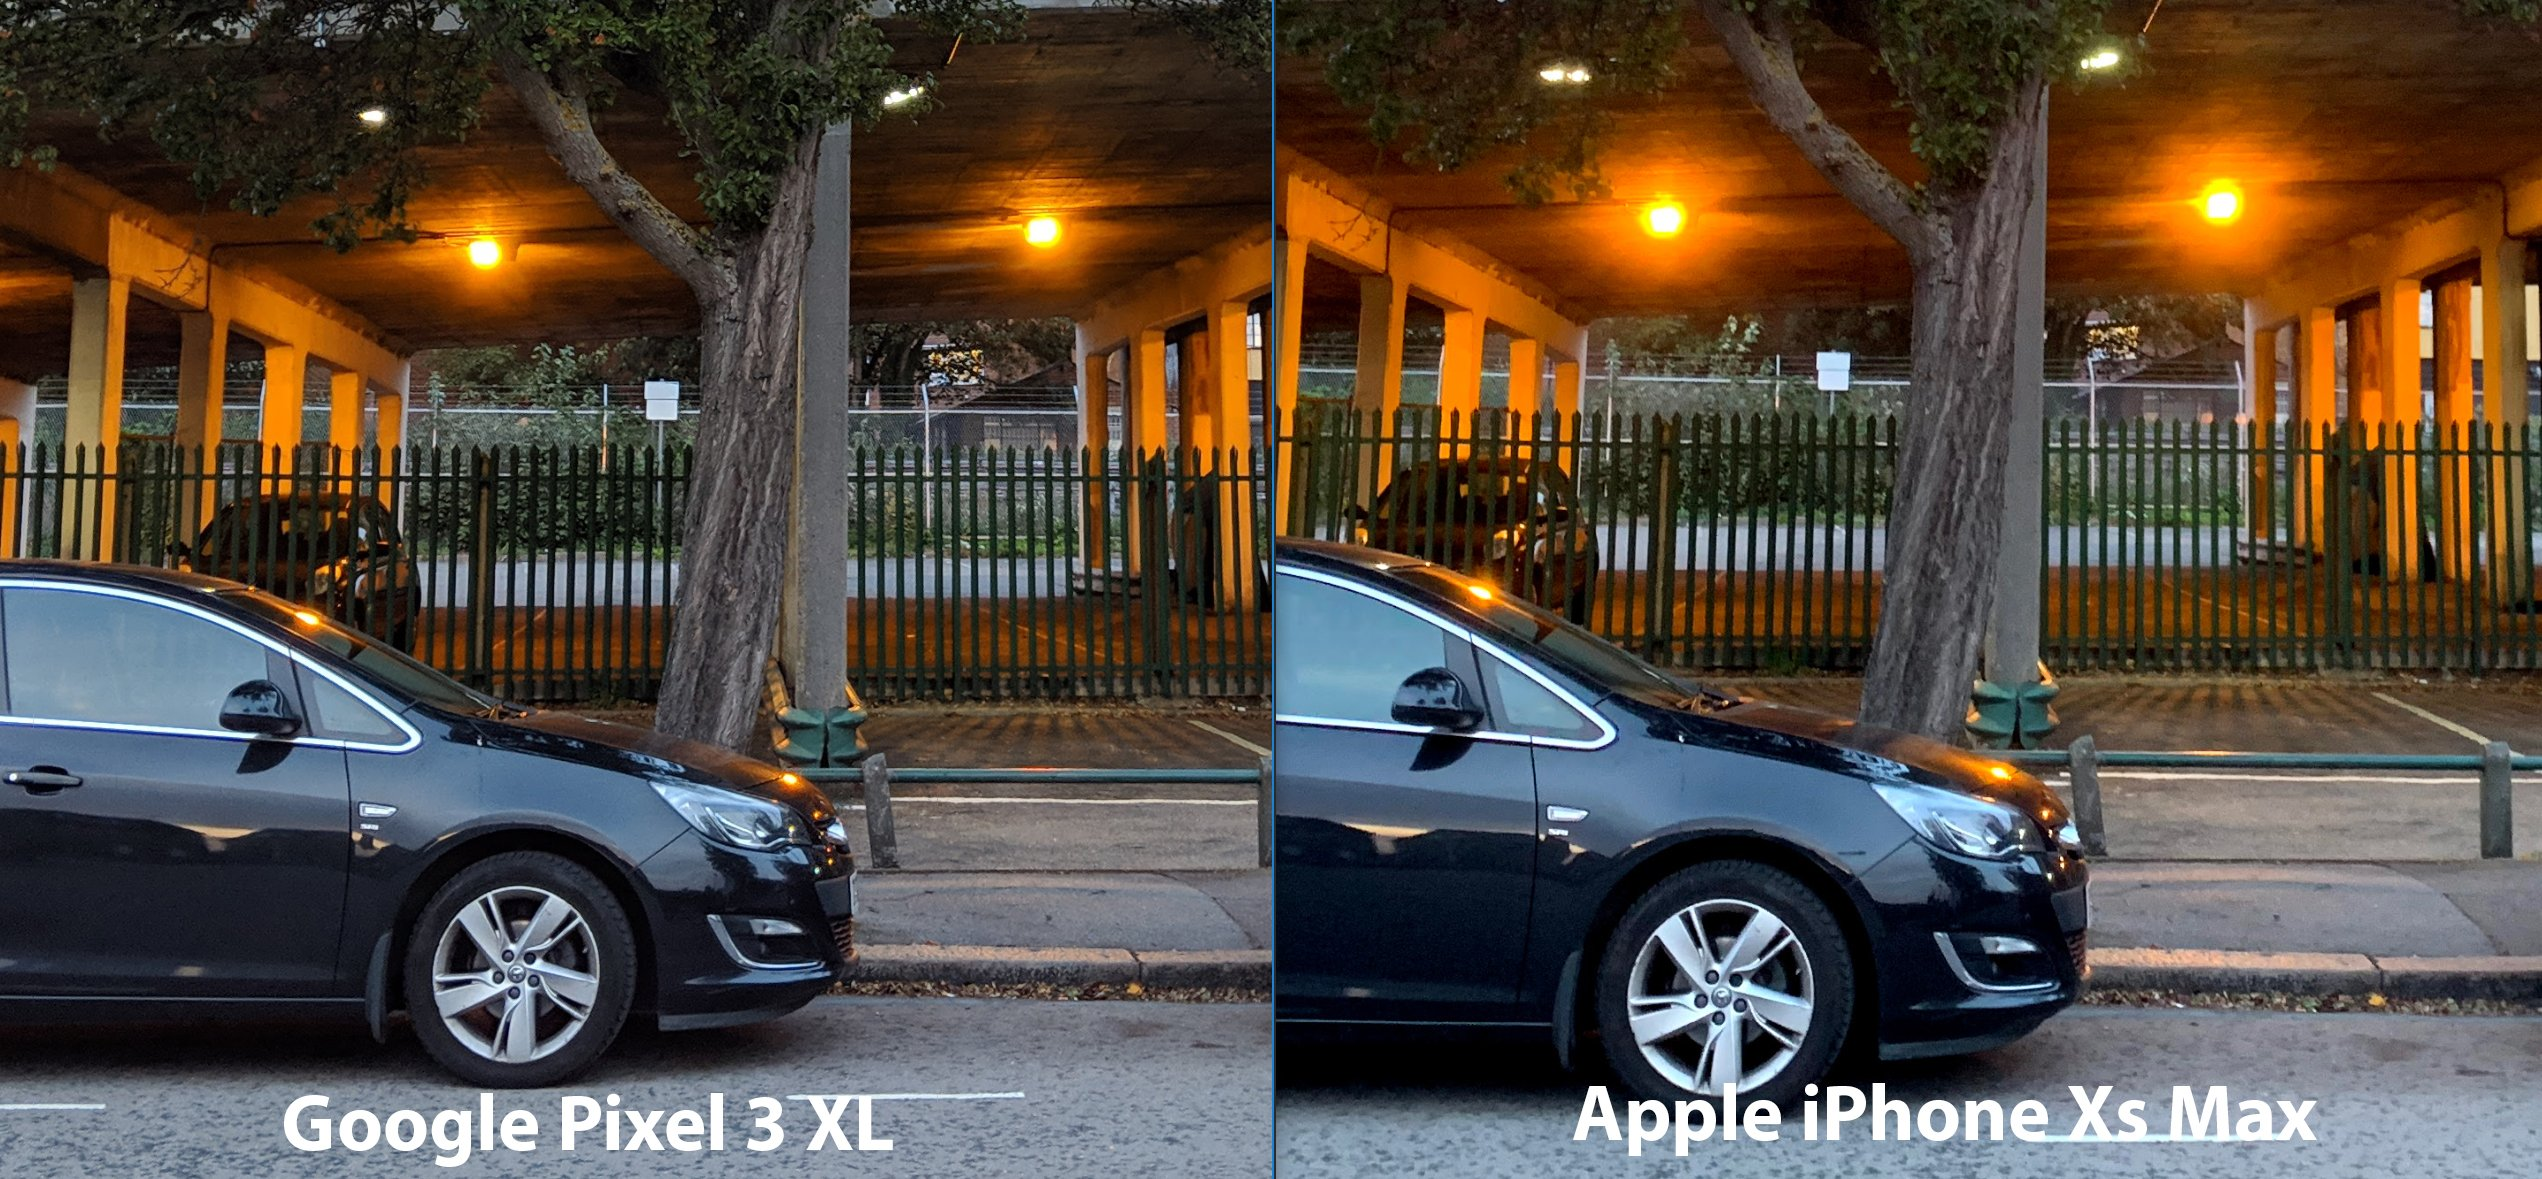 Google Pixel 3 XL review: Brilliant, but Google is treading